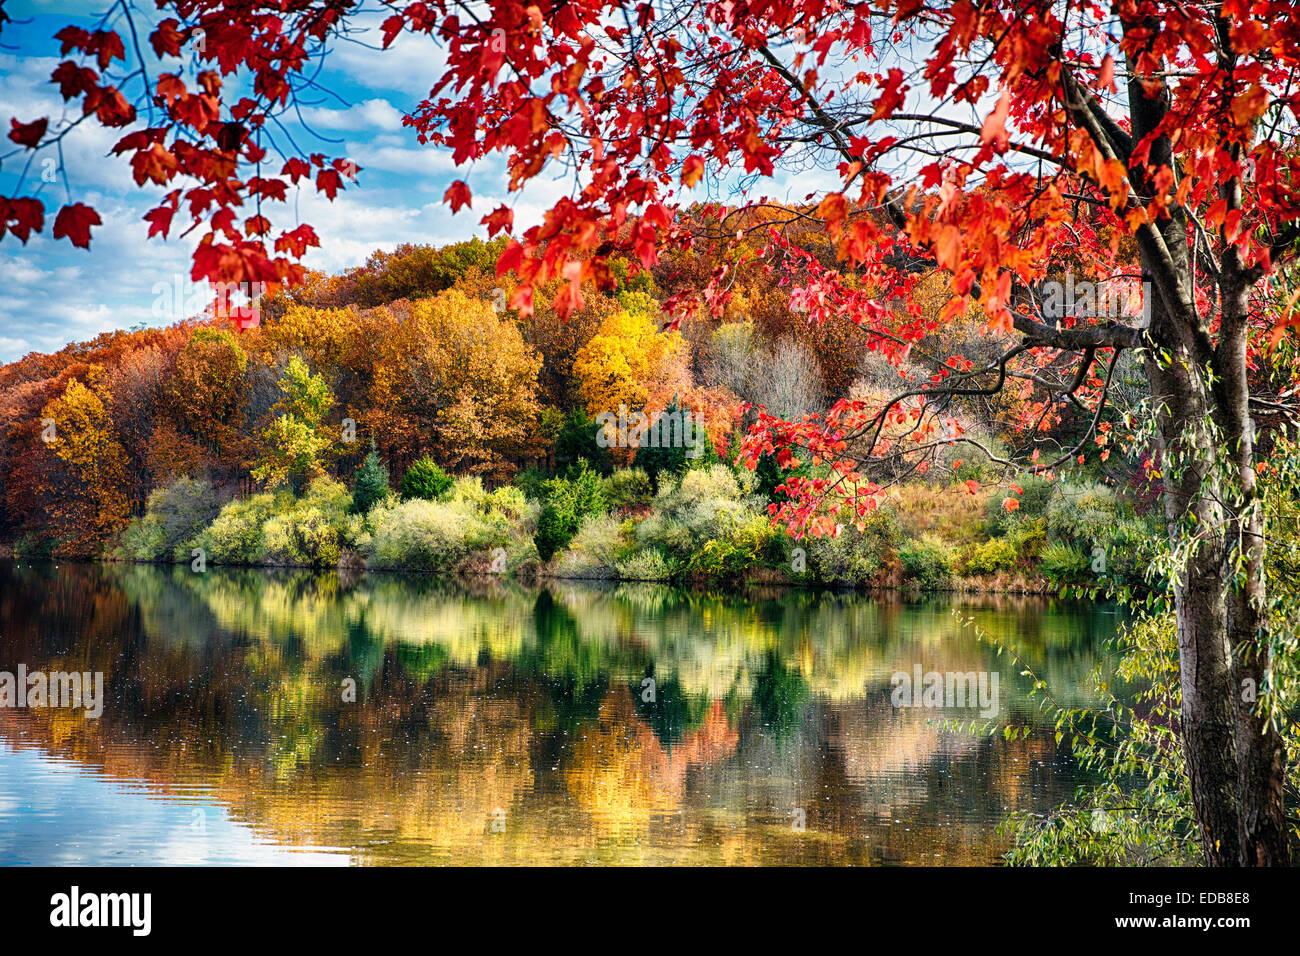 Coloridos árboles reflejos en un lago, Embalse de valle Redondo, Hunterdon County, New Jersey Imagen De Stock